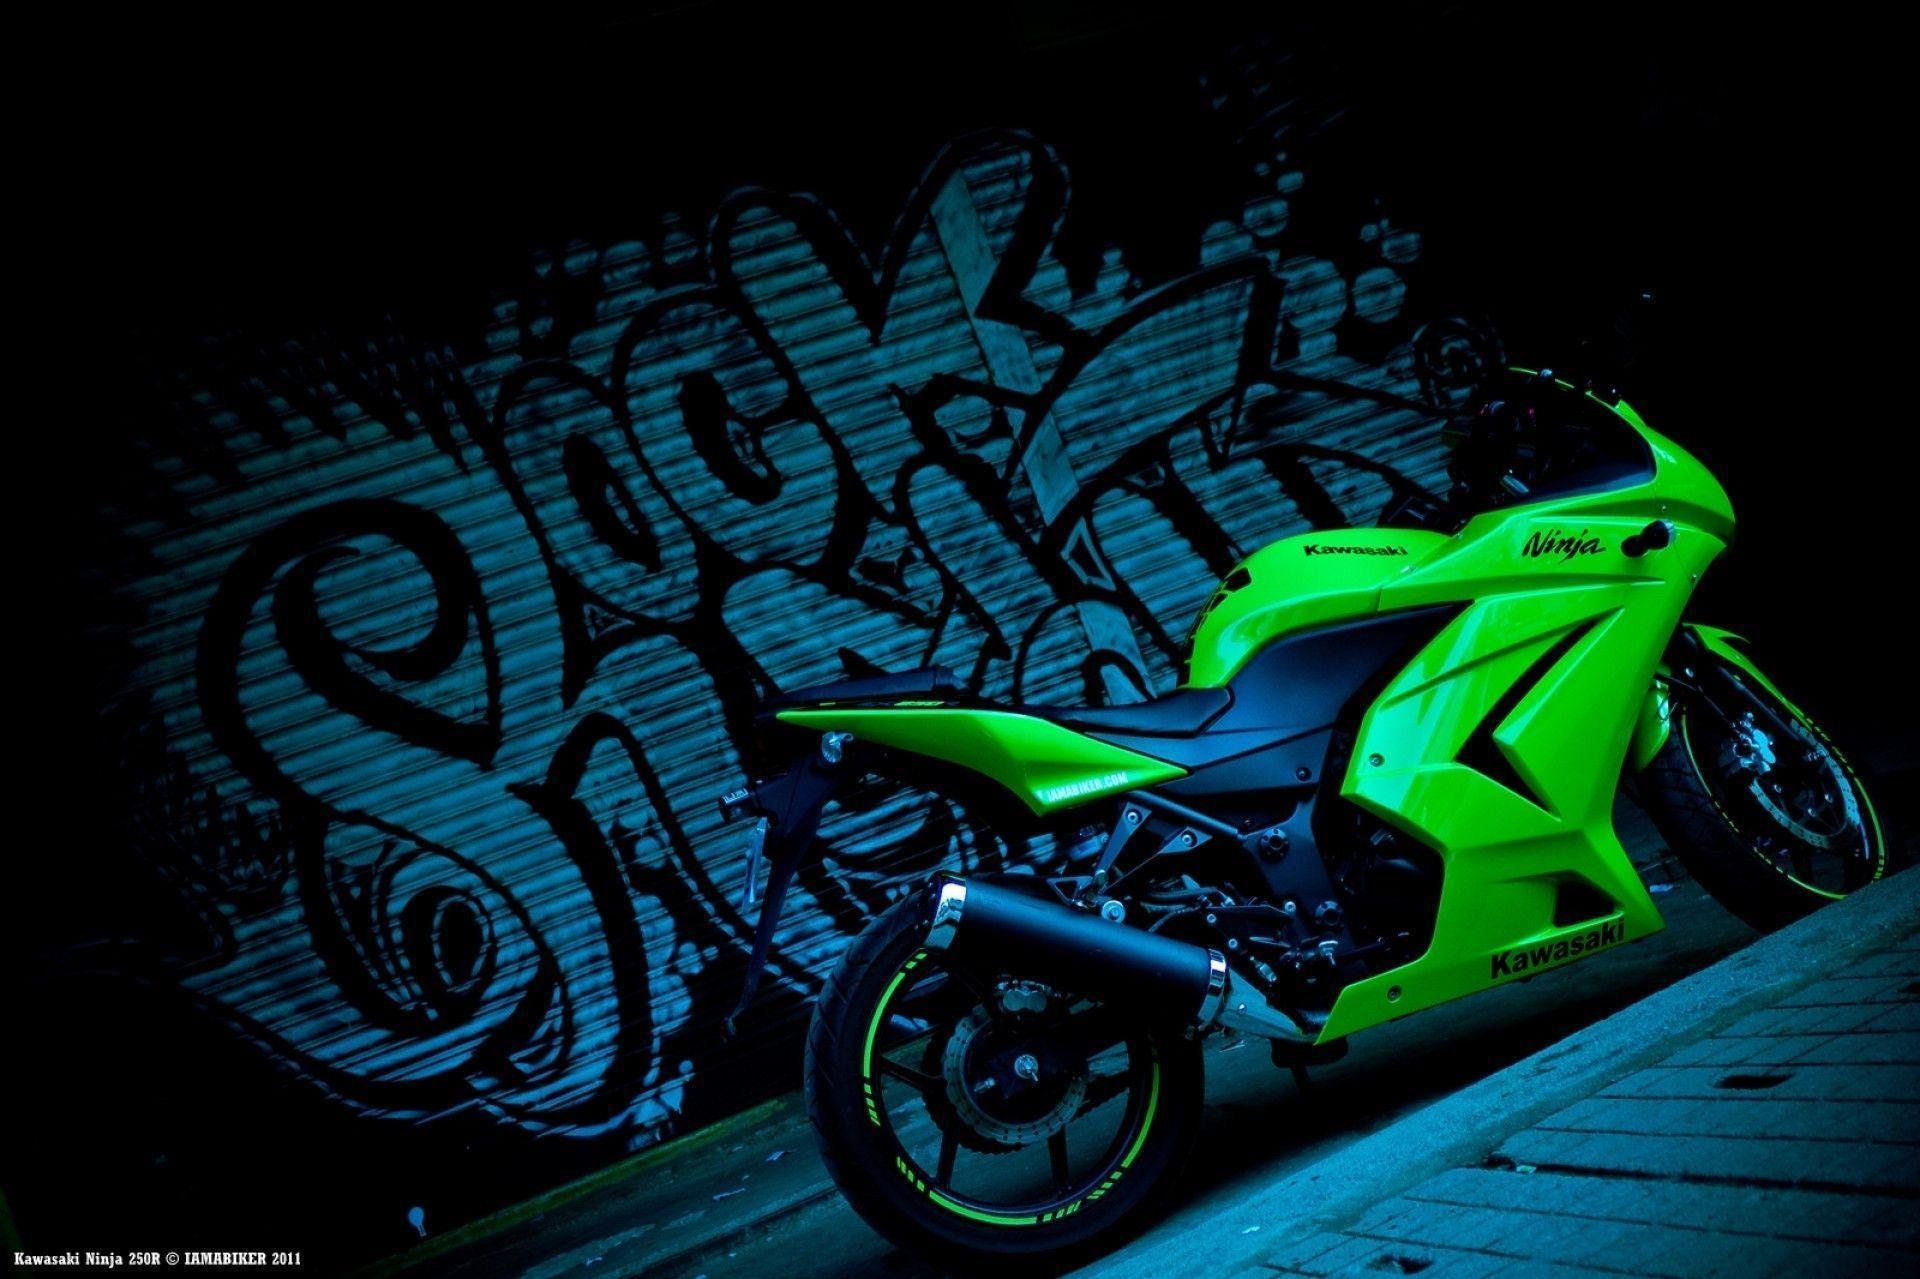 2015 Kawasaki Ninja 250R Wallpapers Wallpaper Cave